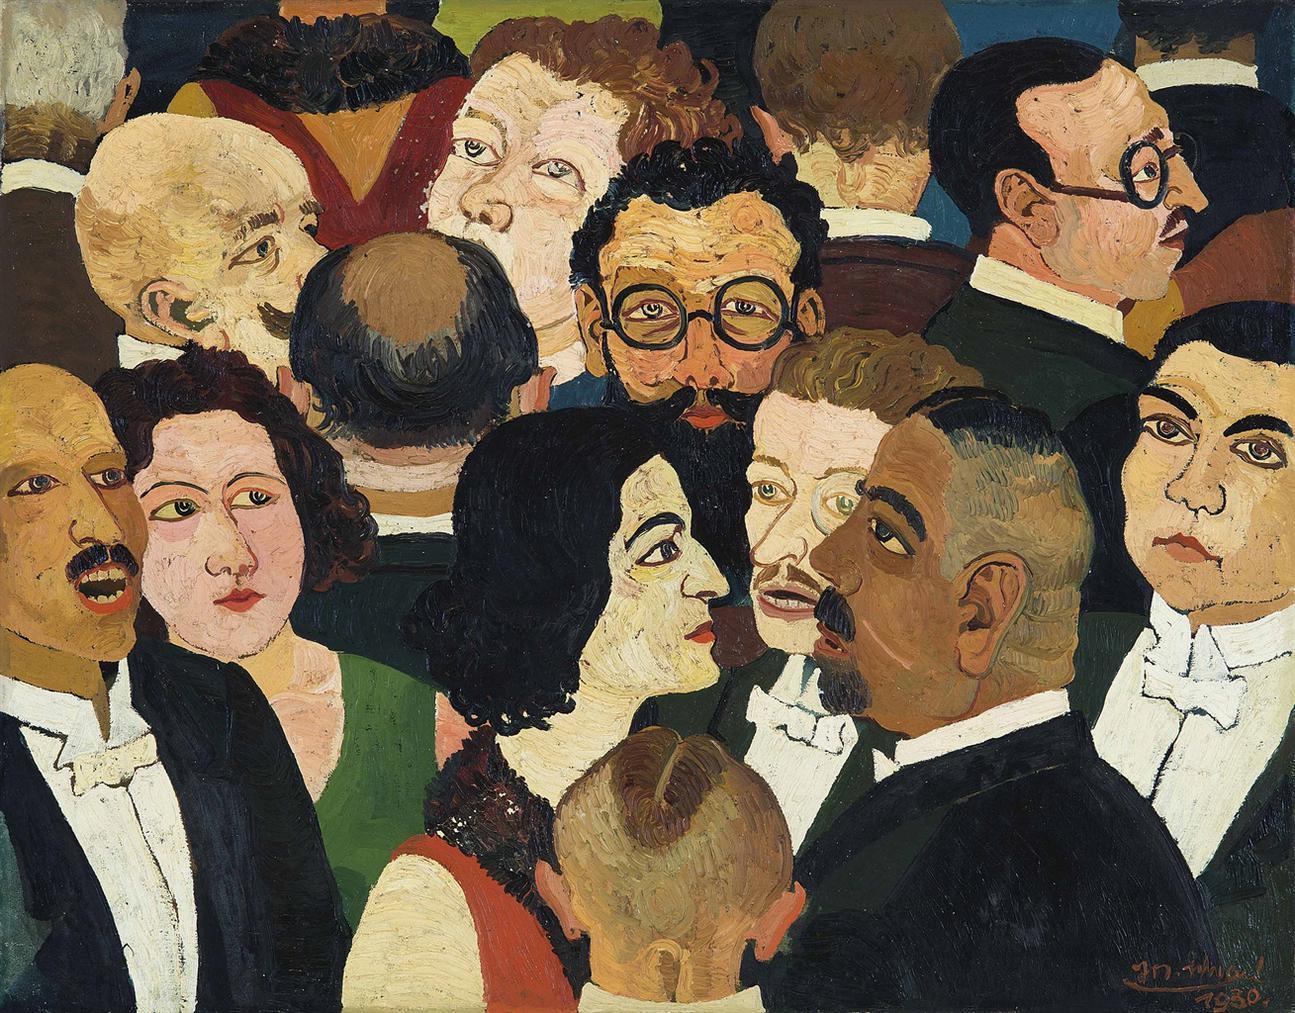 Josef Scharl-Grosse Gesellschaft (Theaterpause)-1930